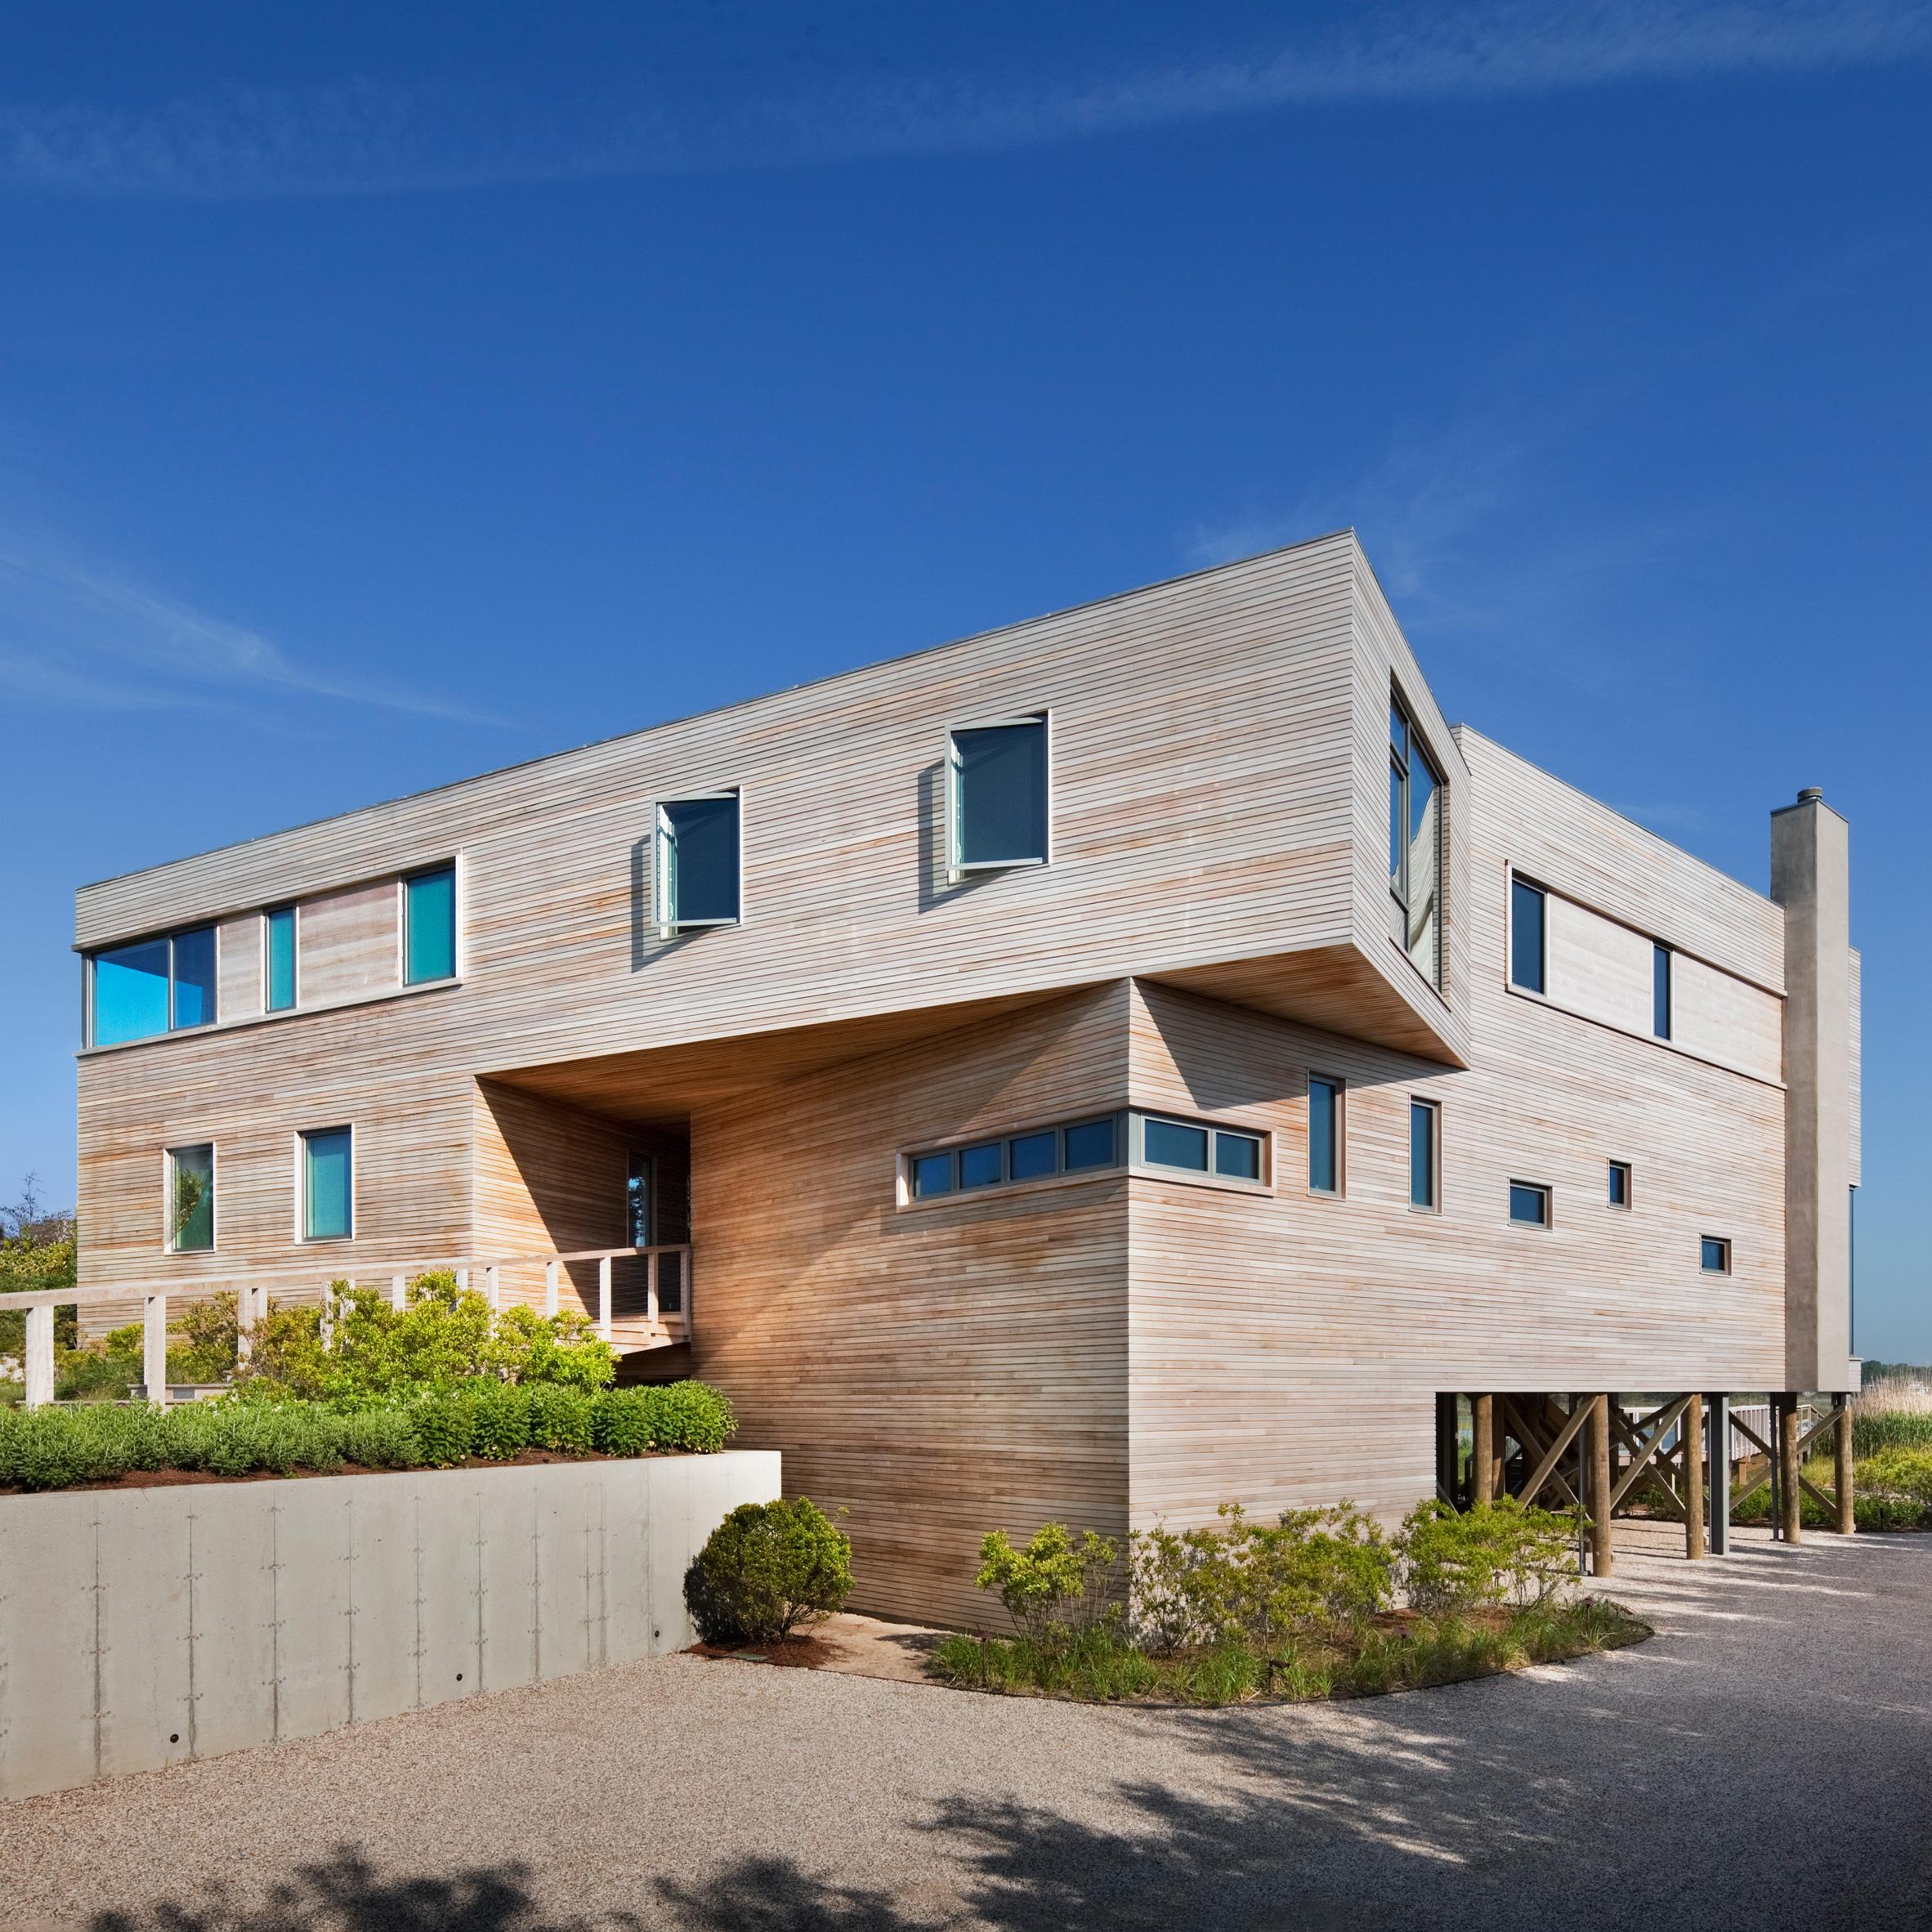 Bay House by Leroy Street Studio, The Hamptons, USA